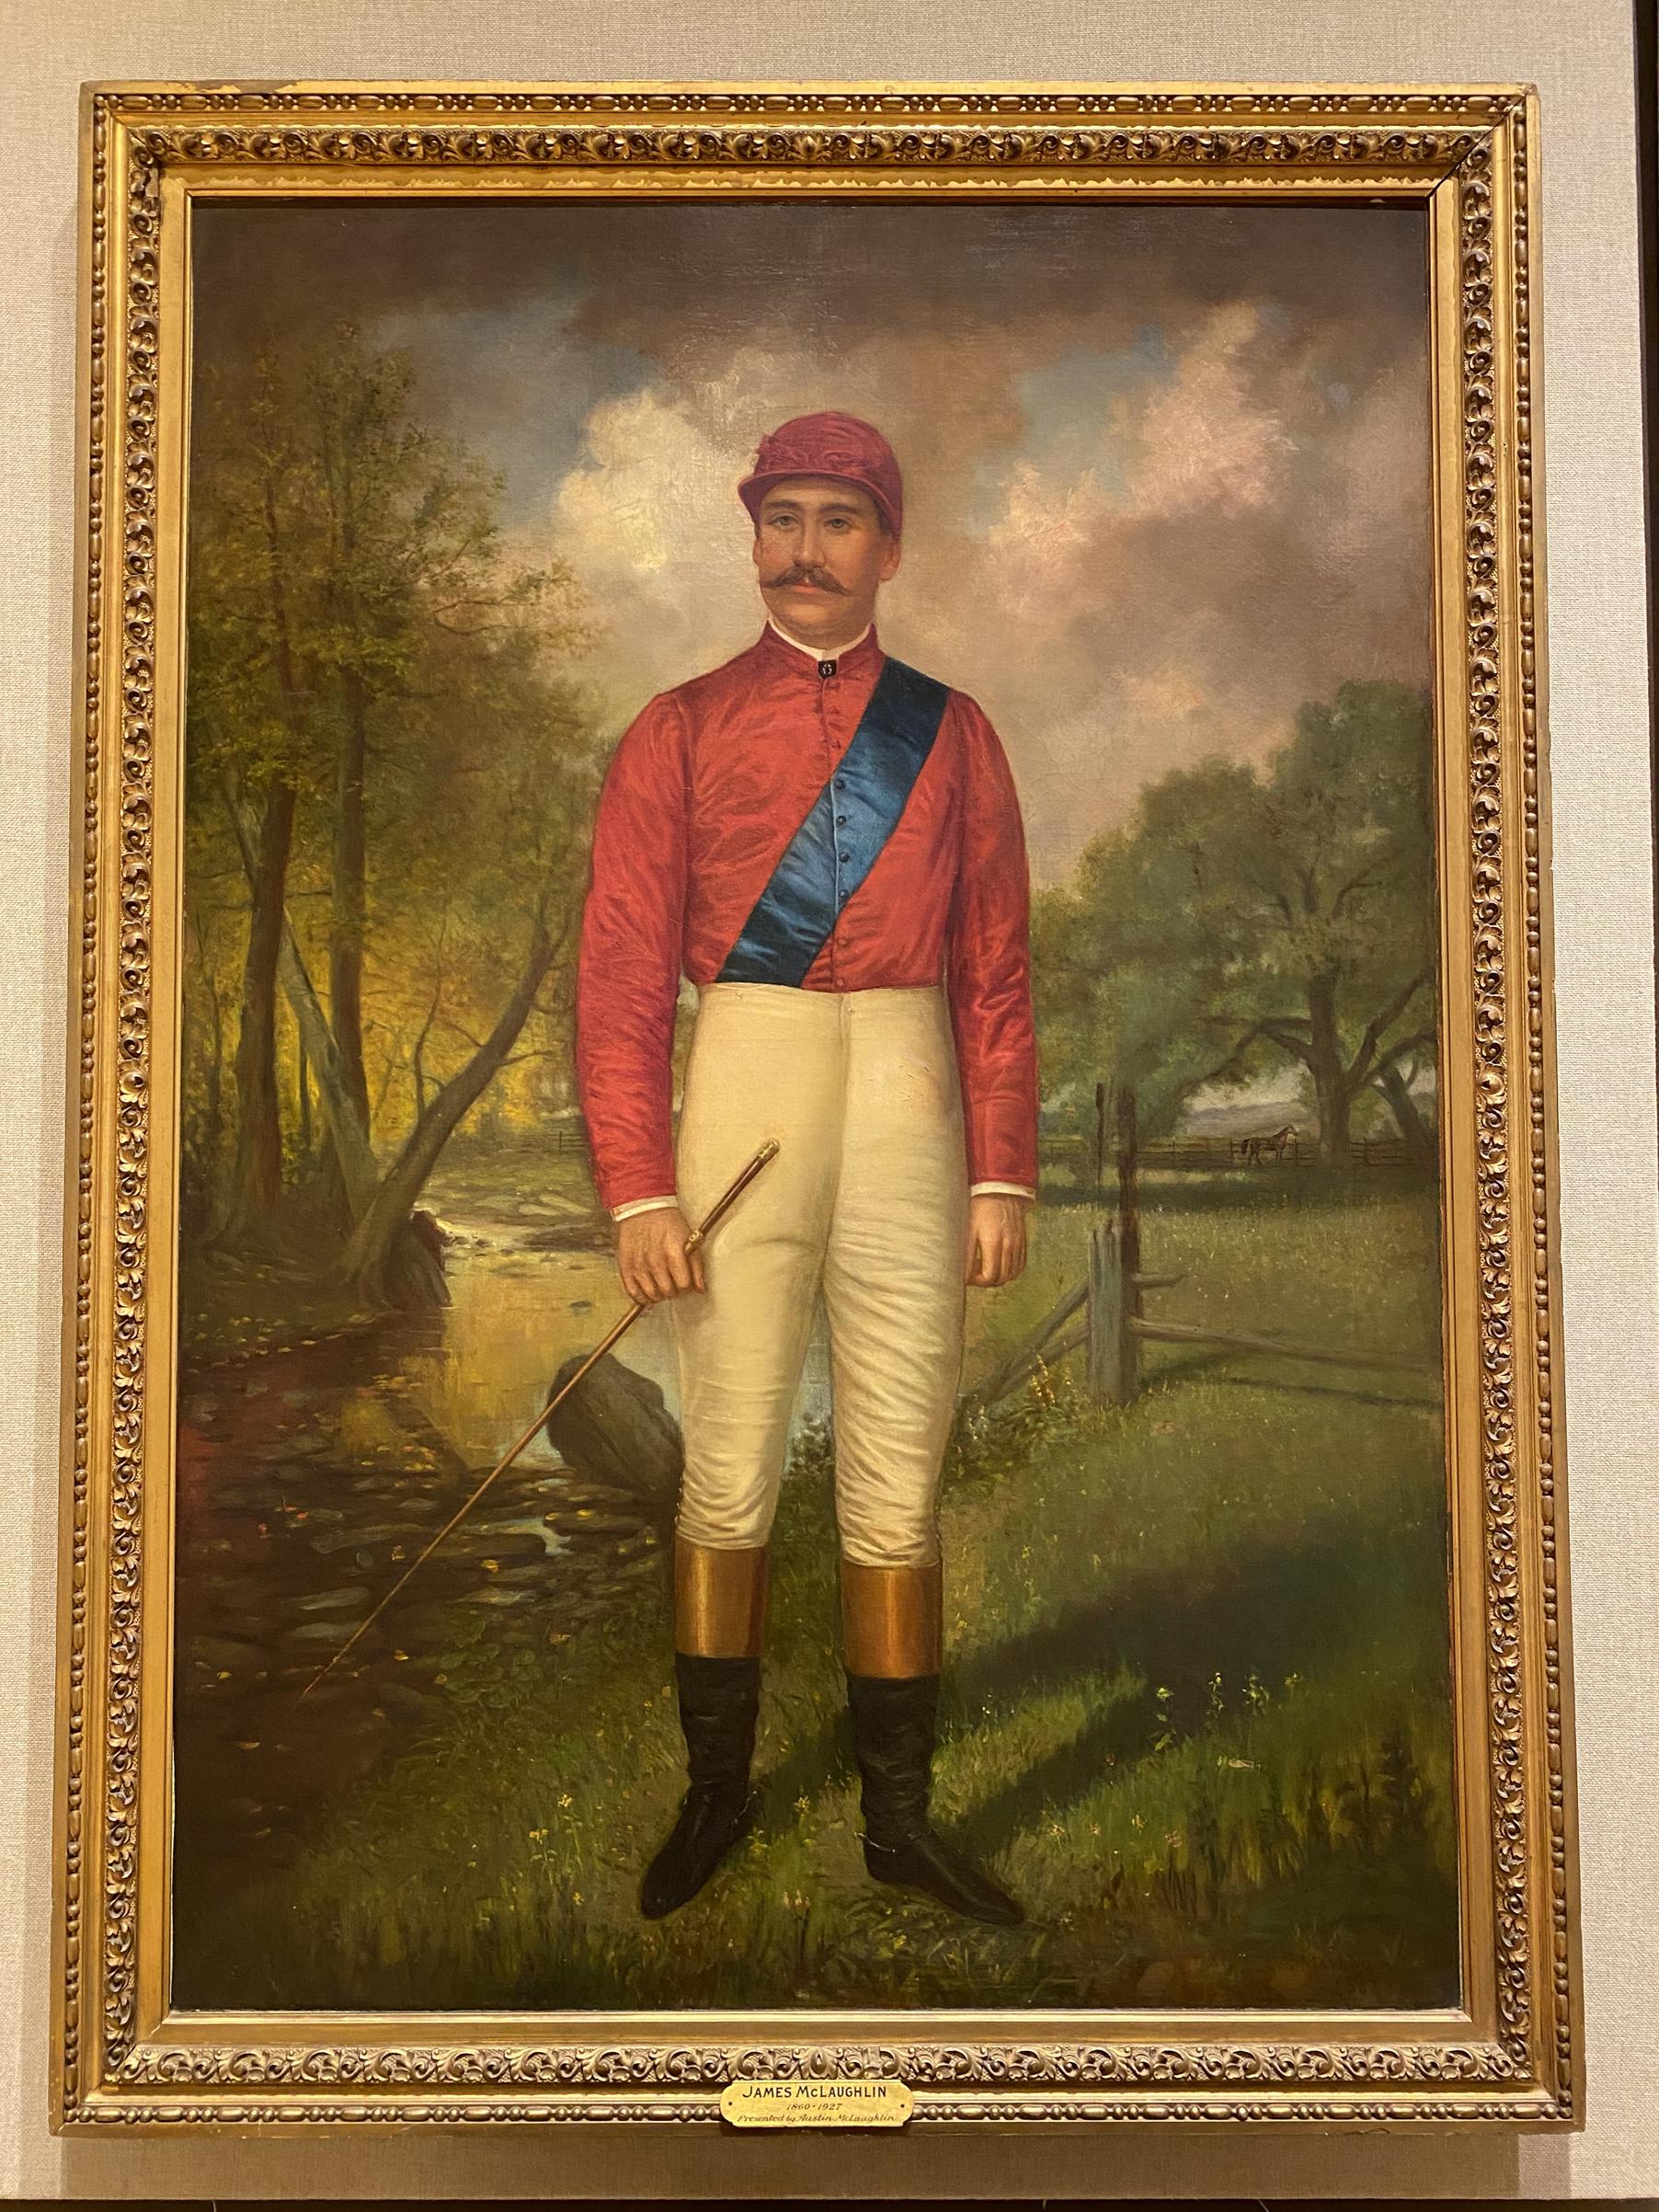 1956.6.1: James McLaughlin by C. C. Markham (1837-1907), Oil on canvas, 1887, Gift: Austin McLaughlin